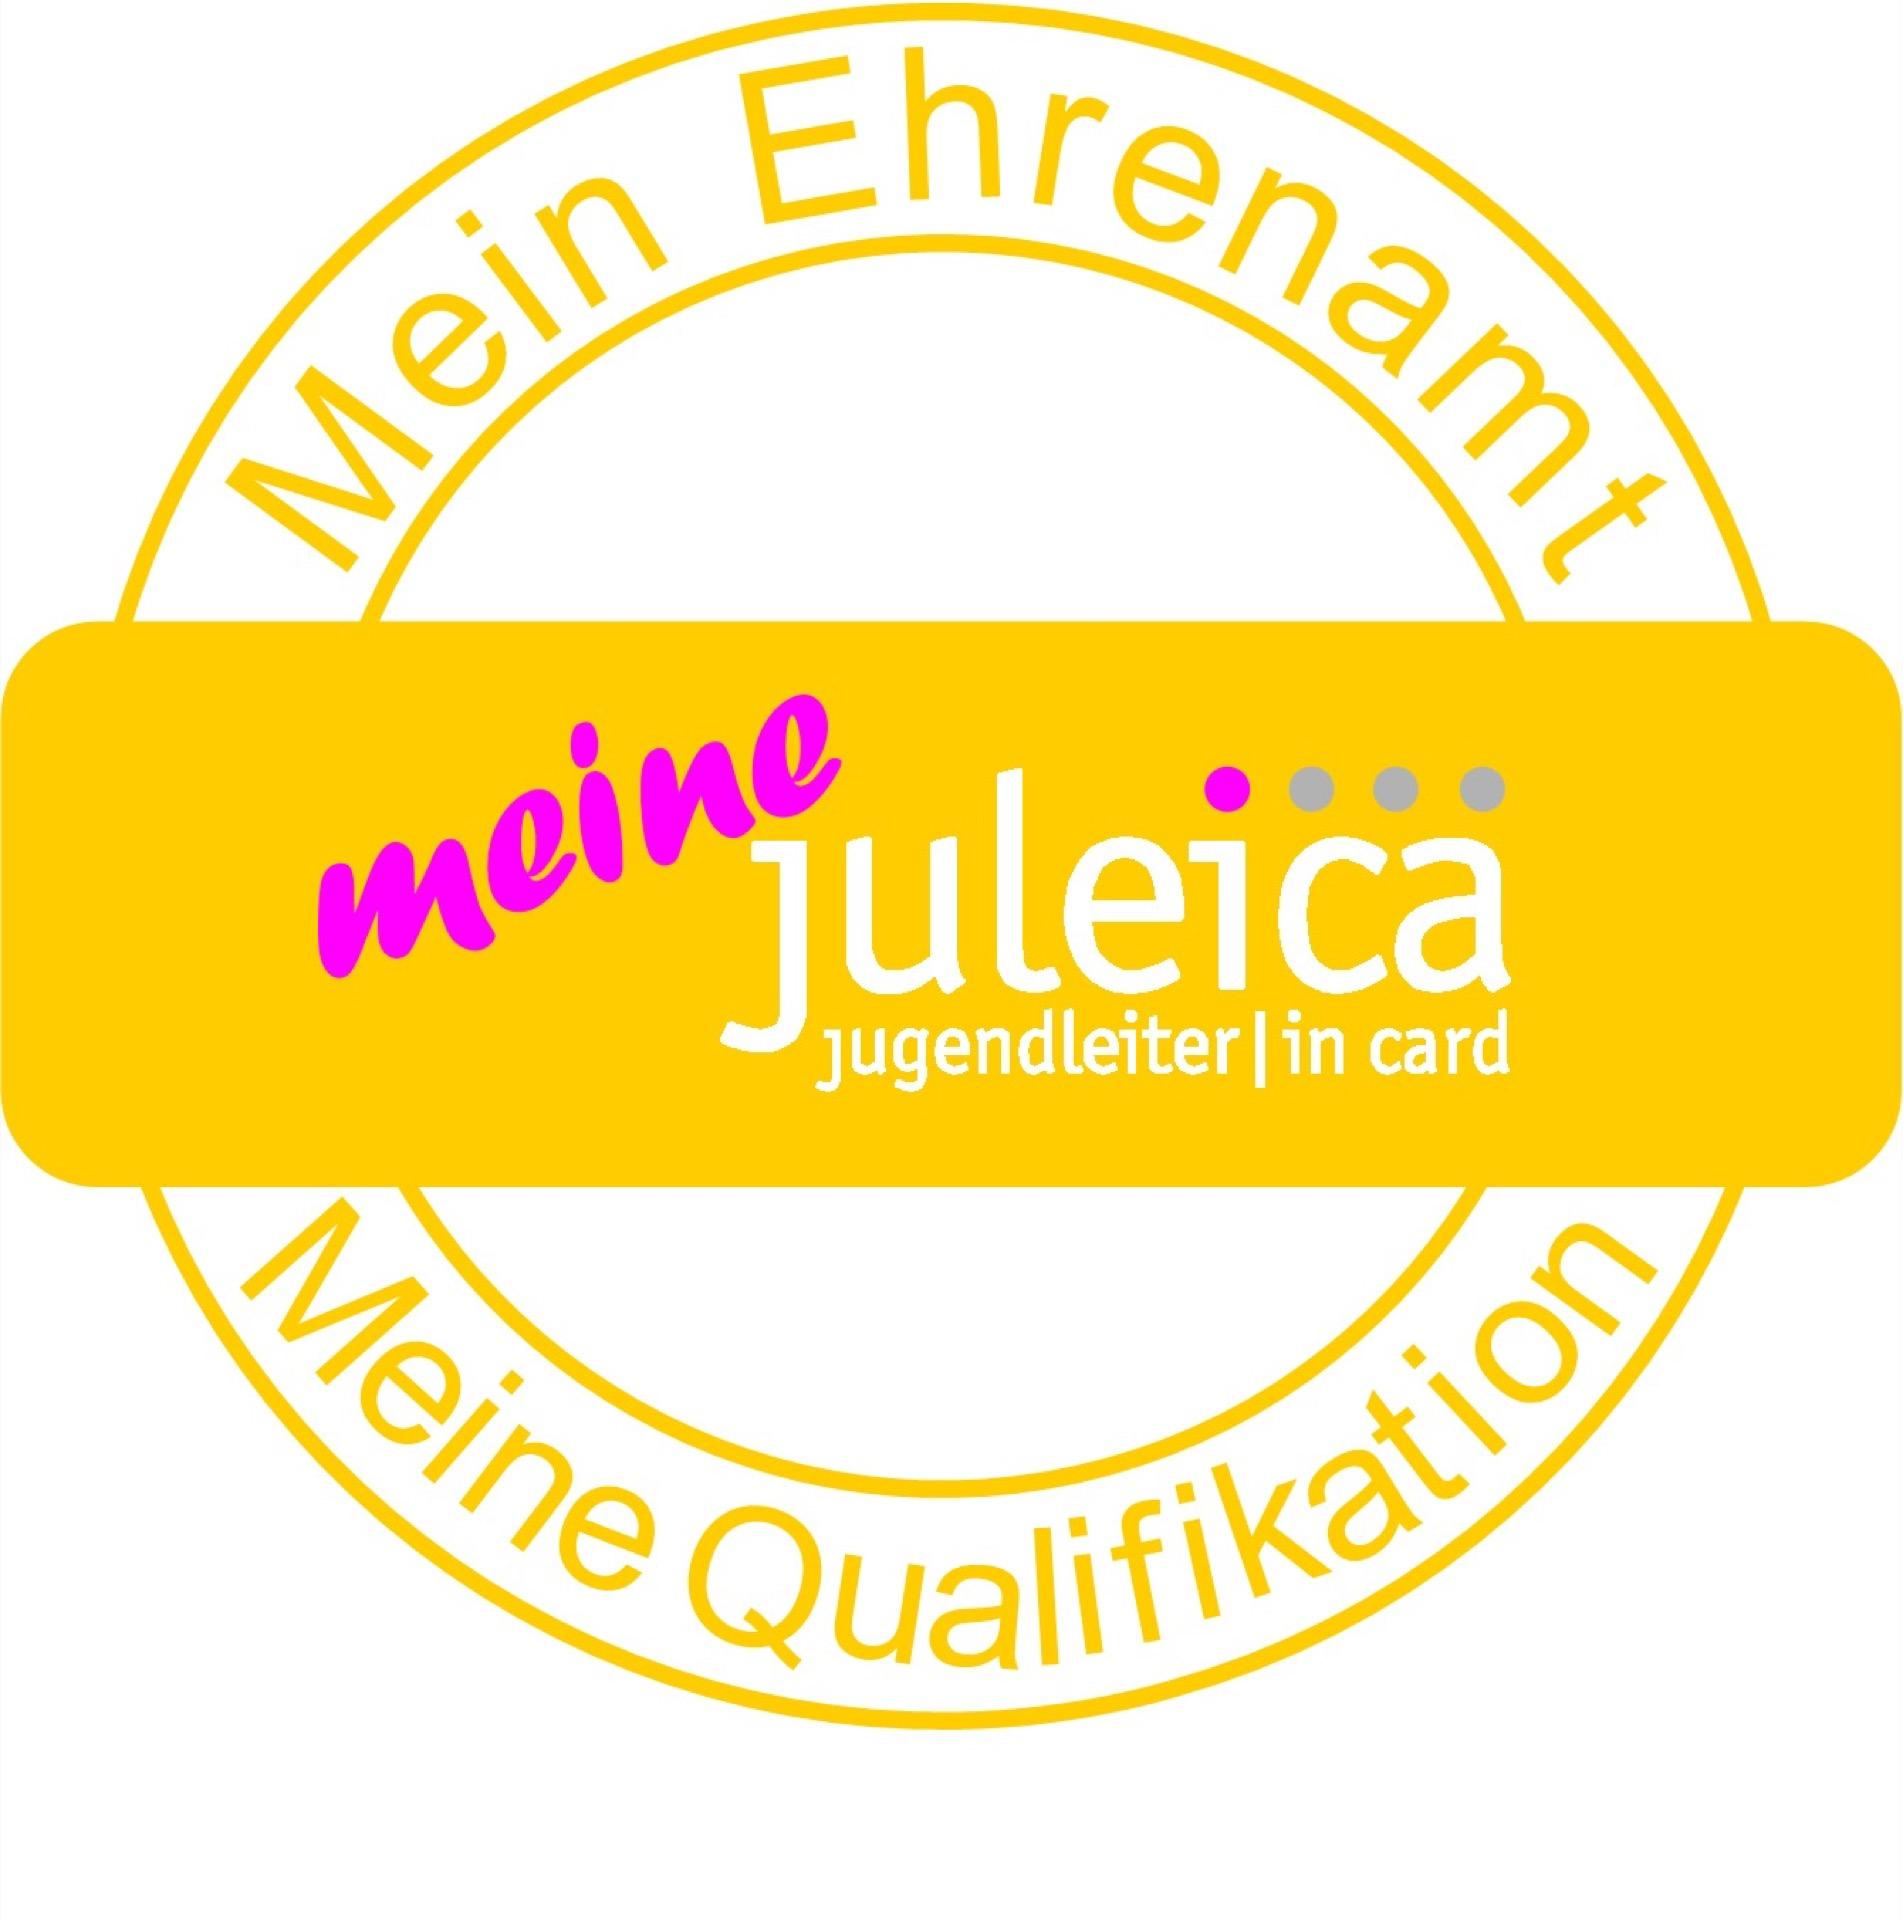 Juleica (Jugendleiter/in-Card)